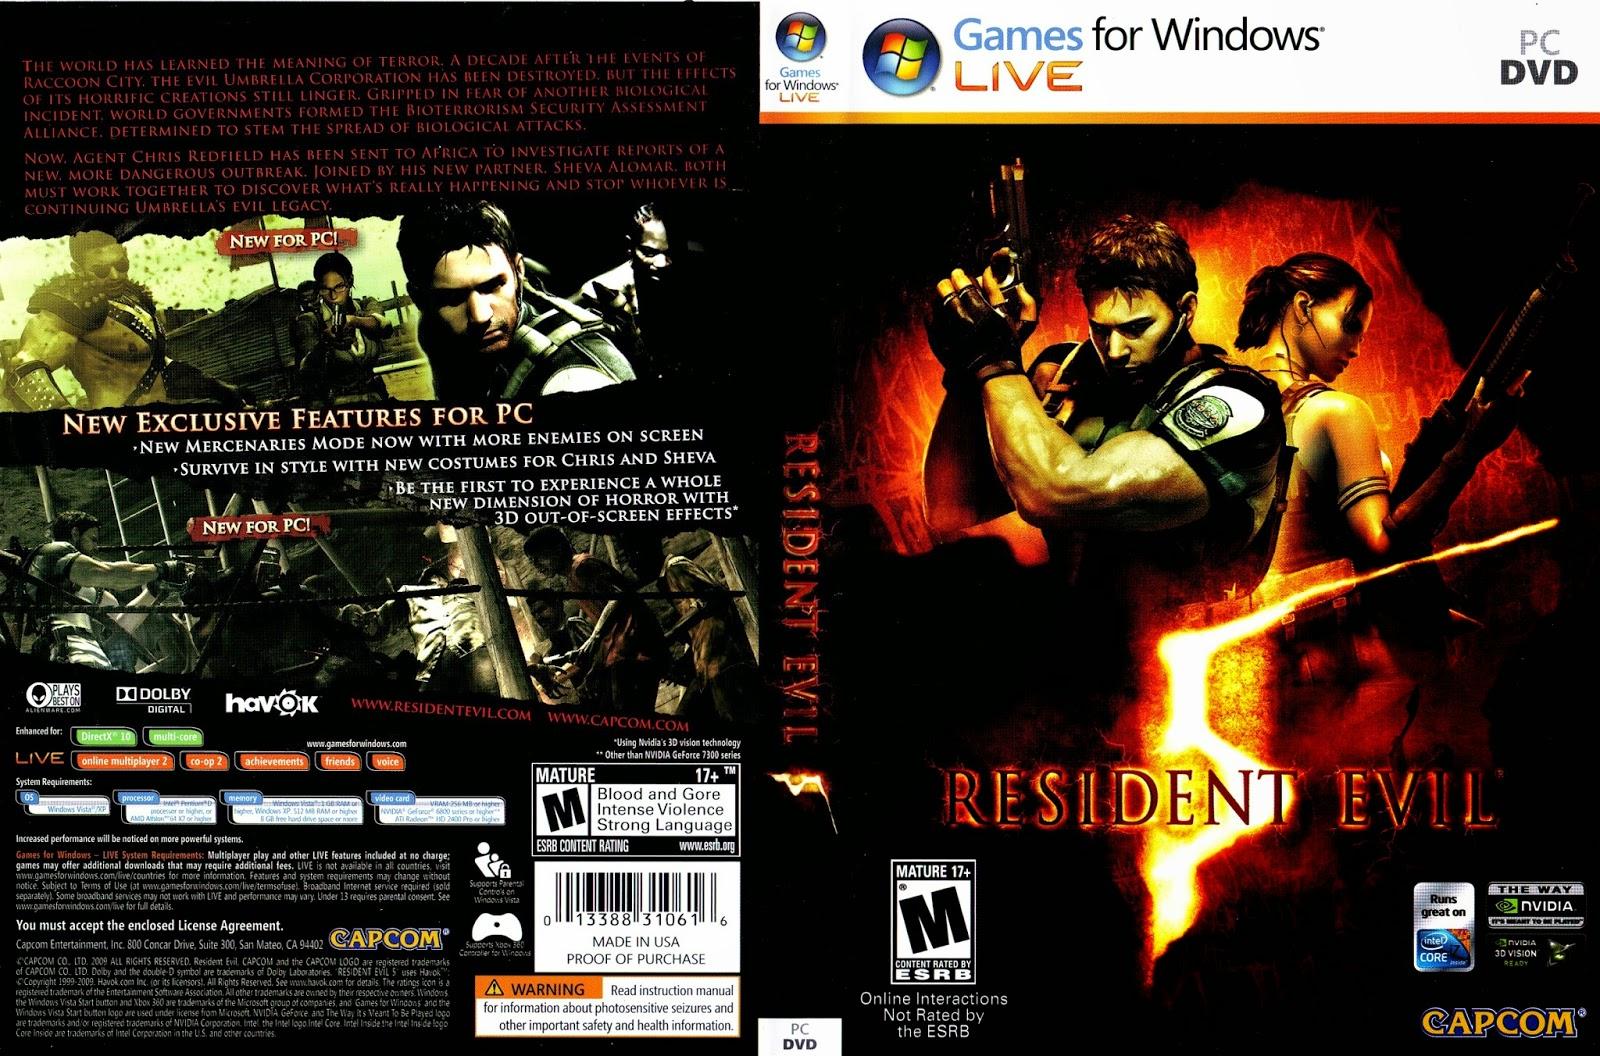 تحميل لعبة Resident Evil 5 برابط واحد مباشر